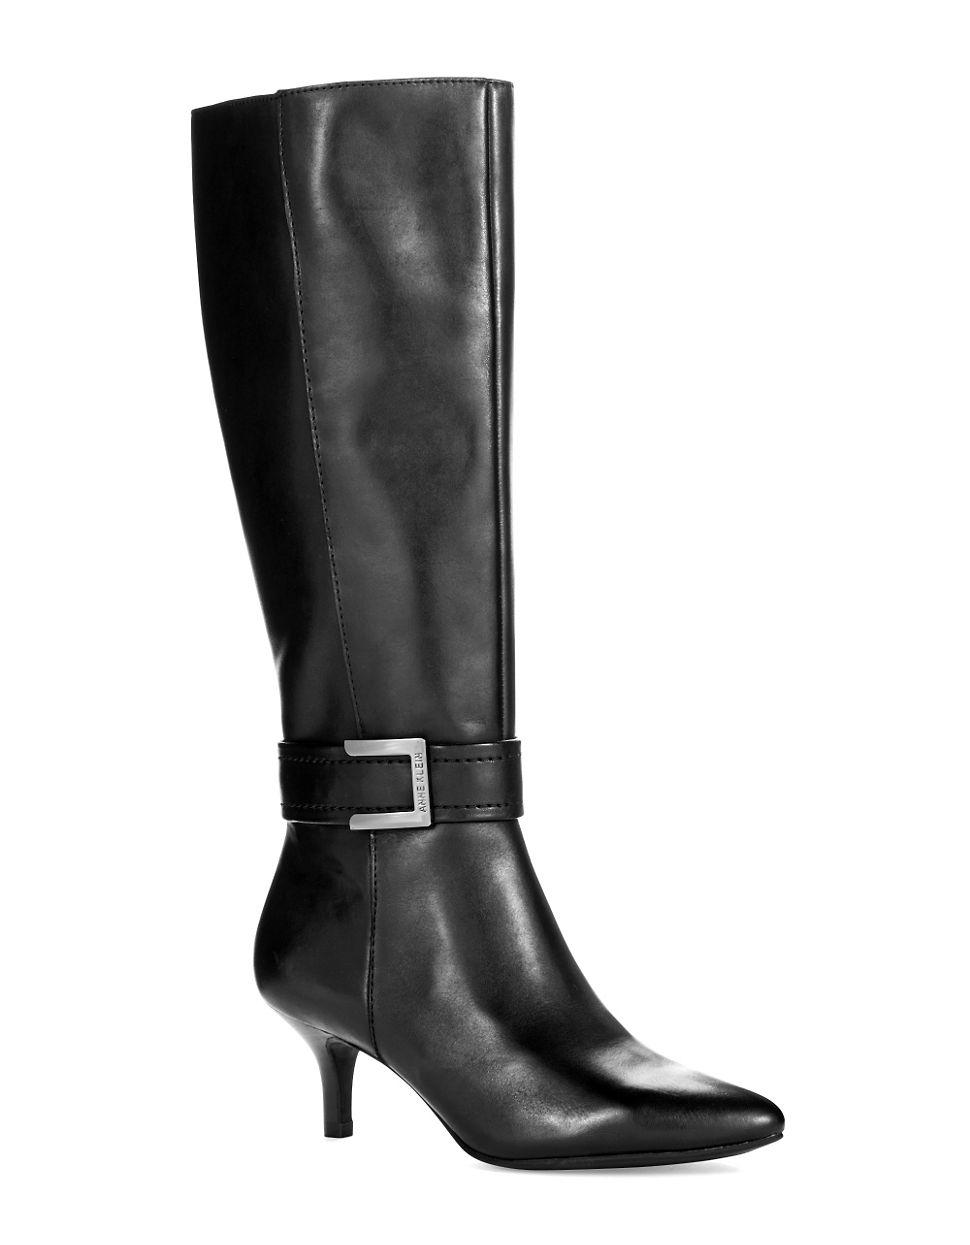 klein cuthbert kitten heel boots in black lyst